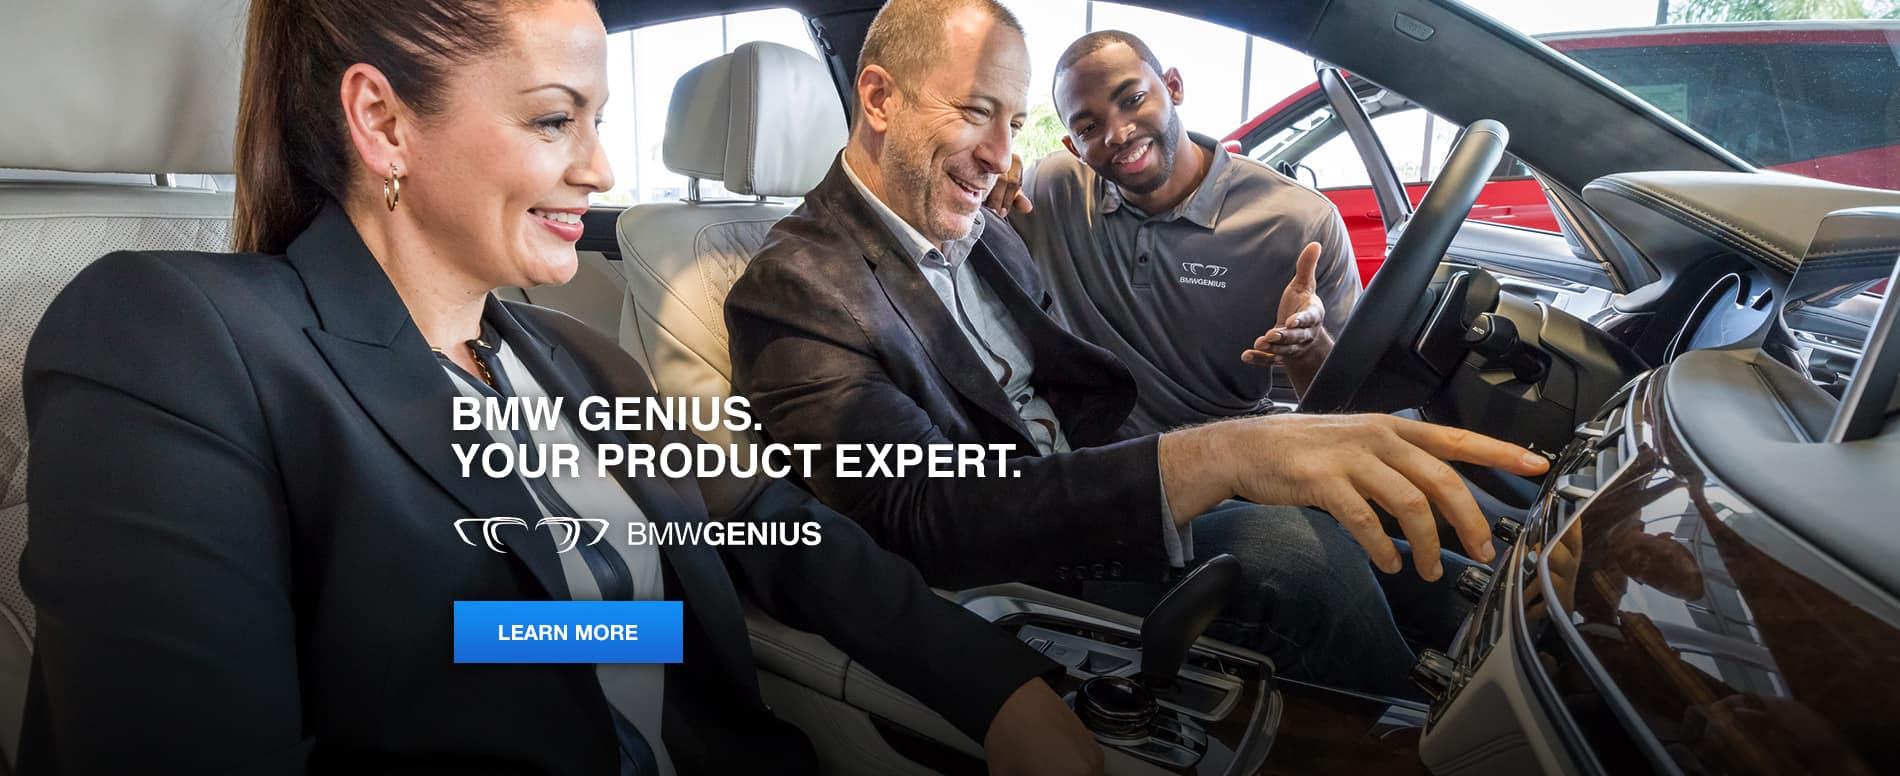 BMW Genius - Your Product Expert